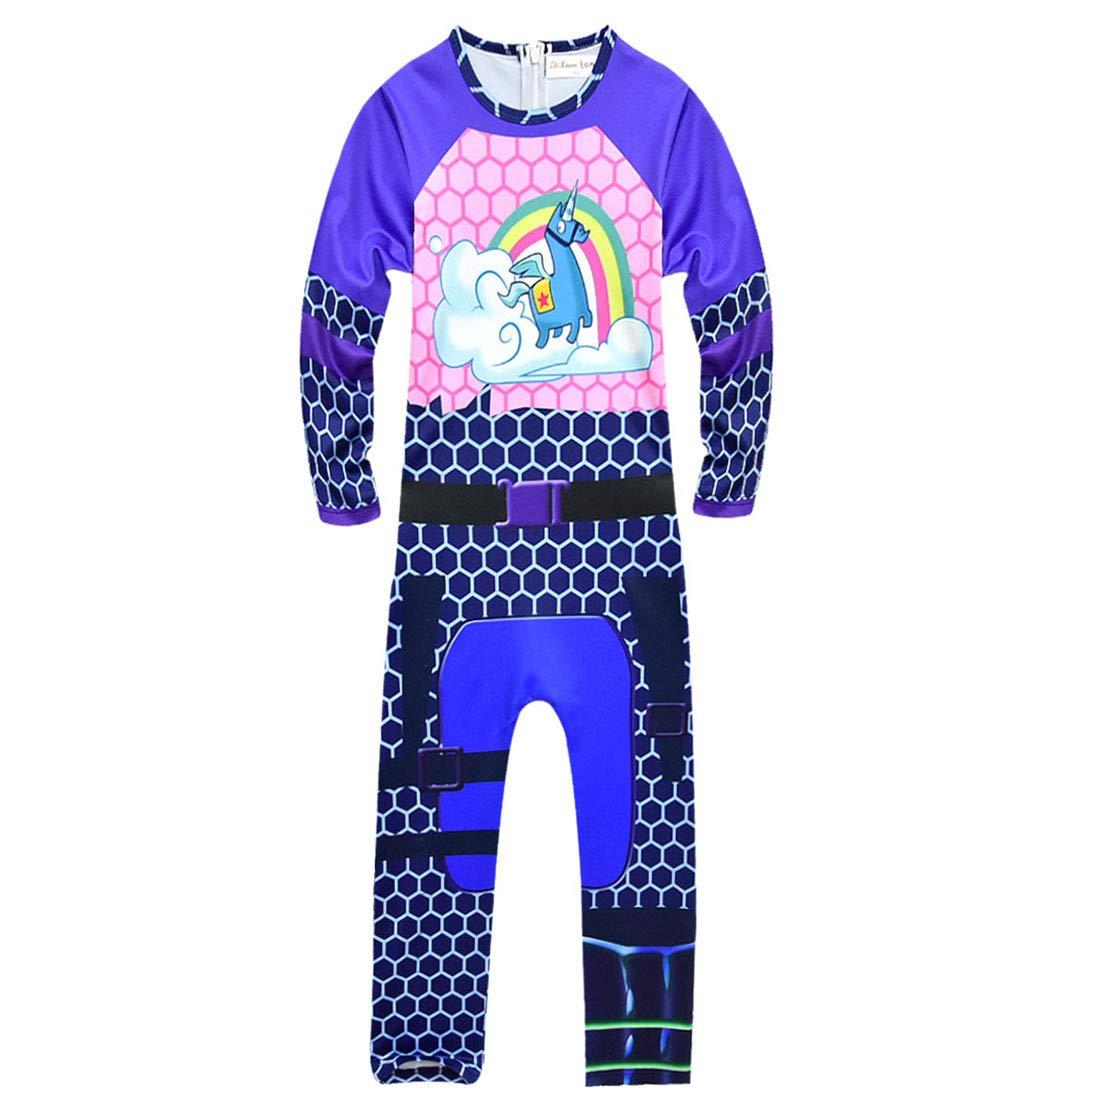 Amazon.com: Kids Game Costume Pajamas Sets Children ...